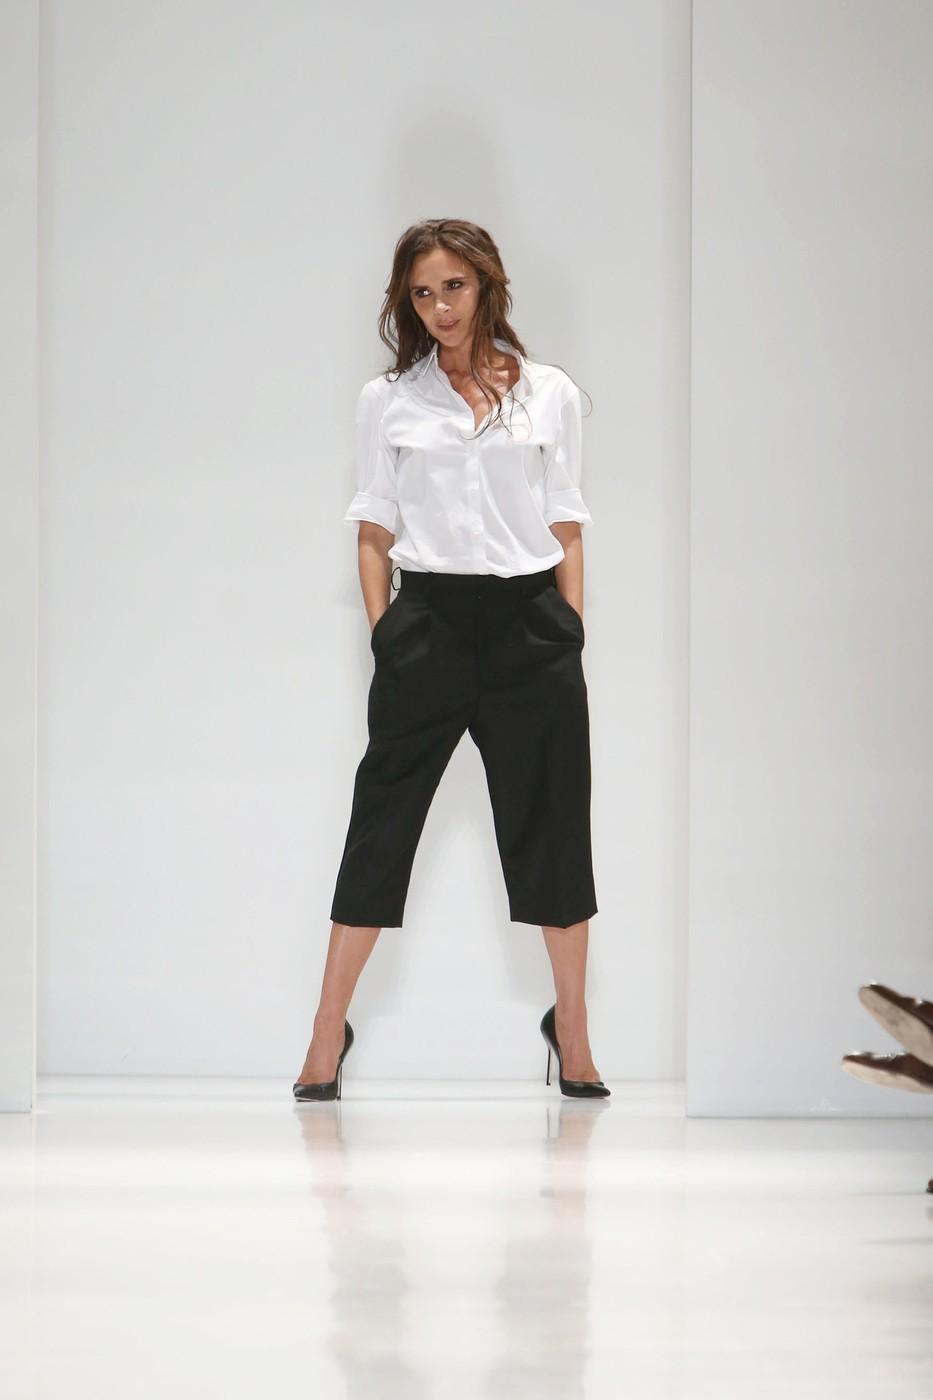 Victoria Beckham predstavila novo kolekcijo (foto: profimedia)